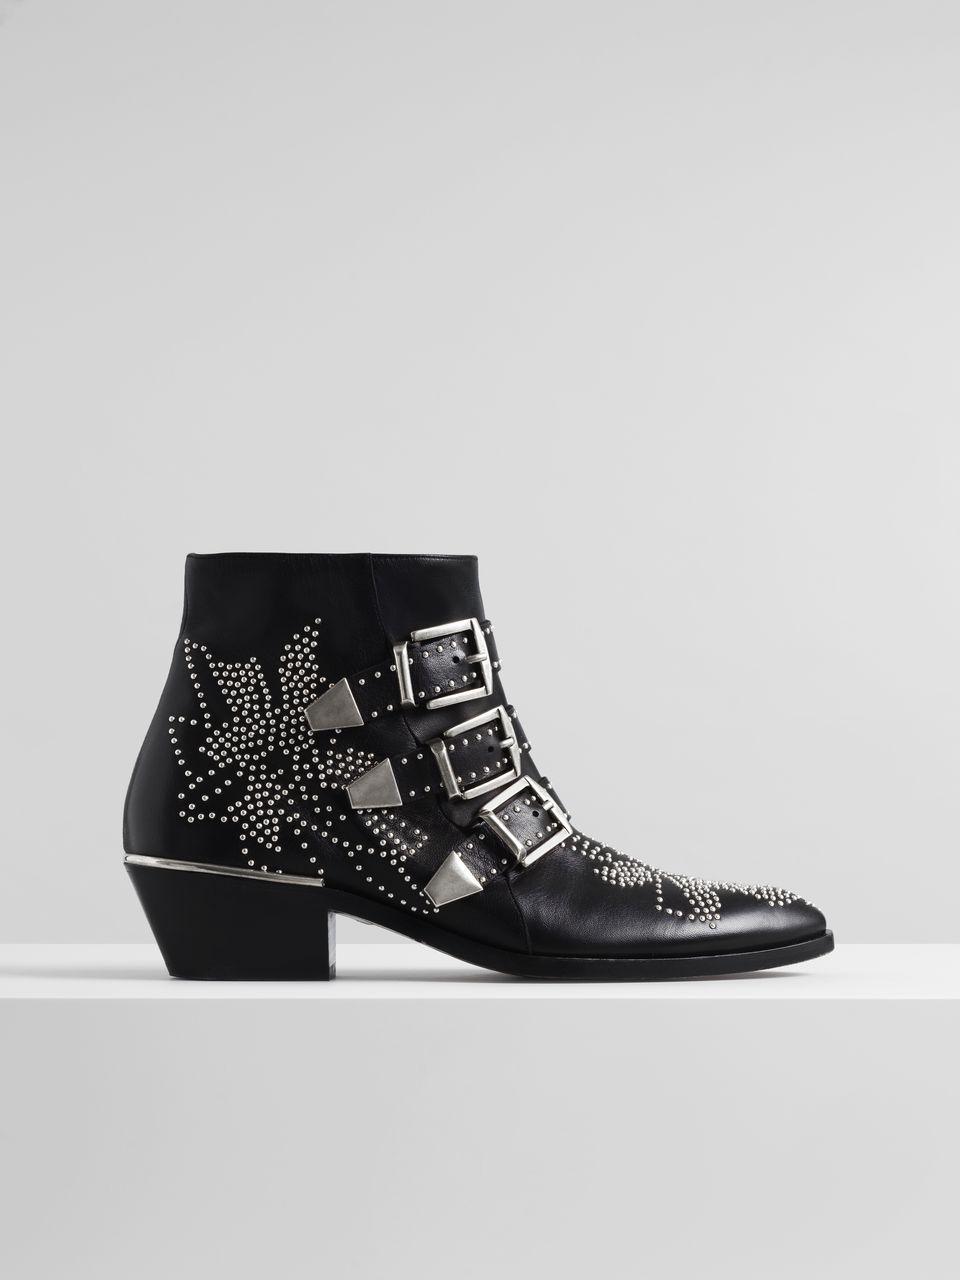 Susanna Studded Ankle Boot In Nappa Sheepskin | Chloé UK